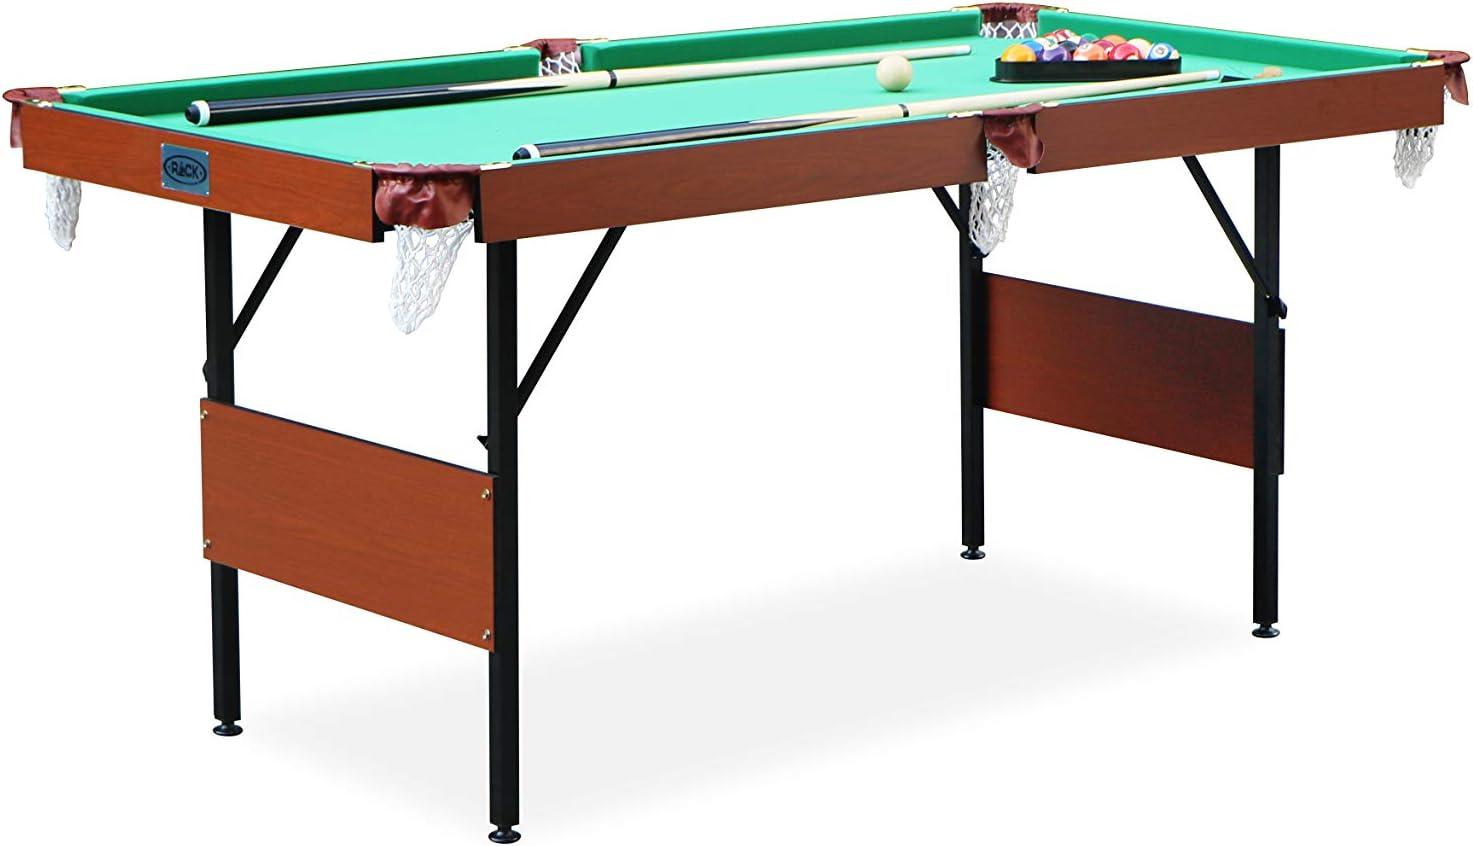 RACK Crux Fashionable Folding 55 Billiard Table Max 53% OFF Pool in